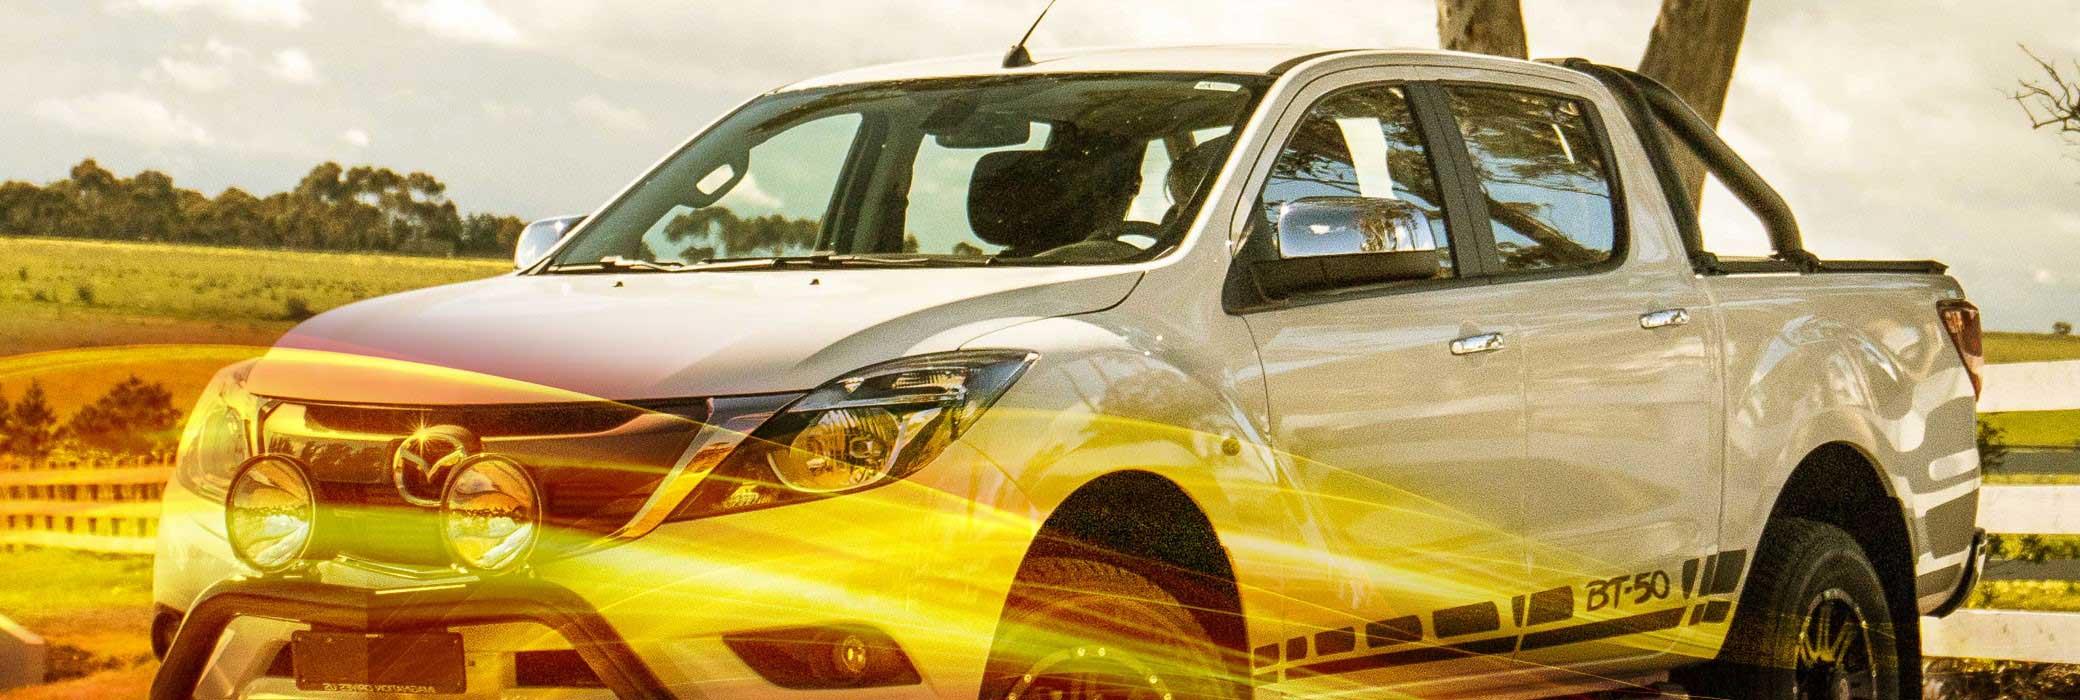 Mazda car battery